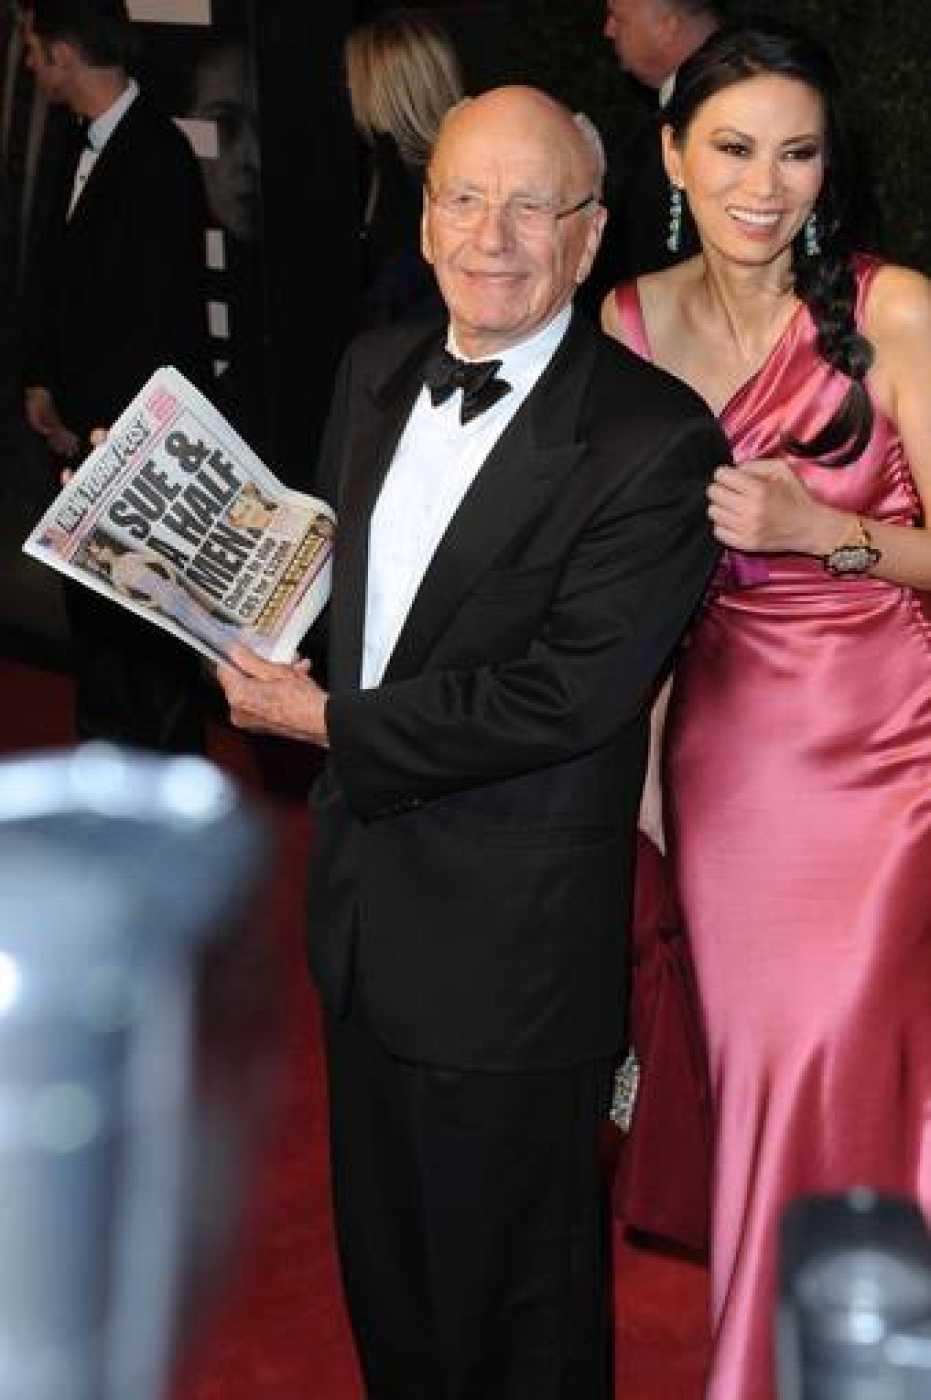 Rupert Murdoch, en una imagen reciente.